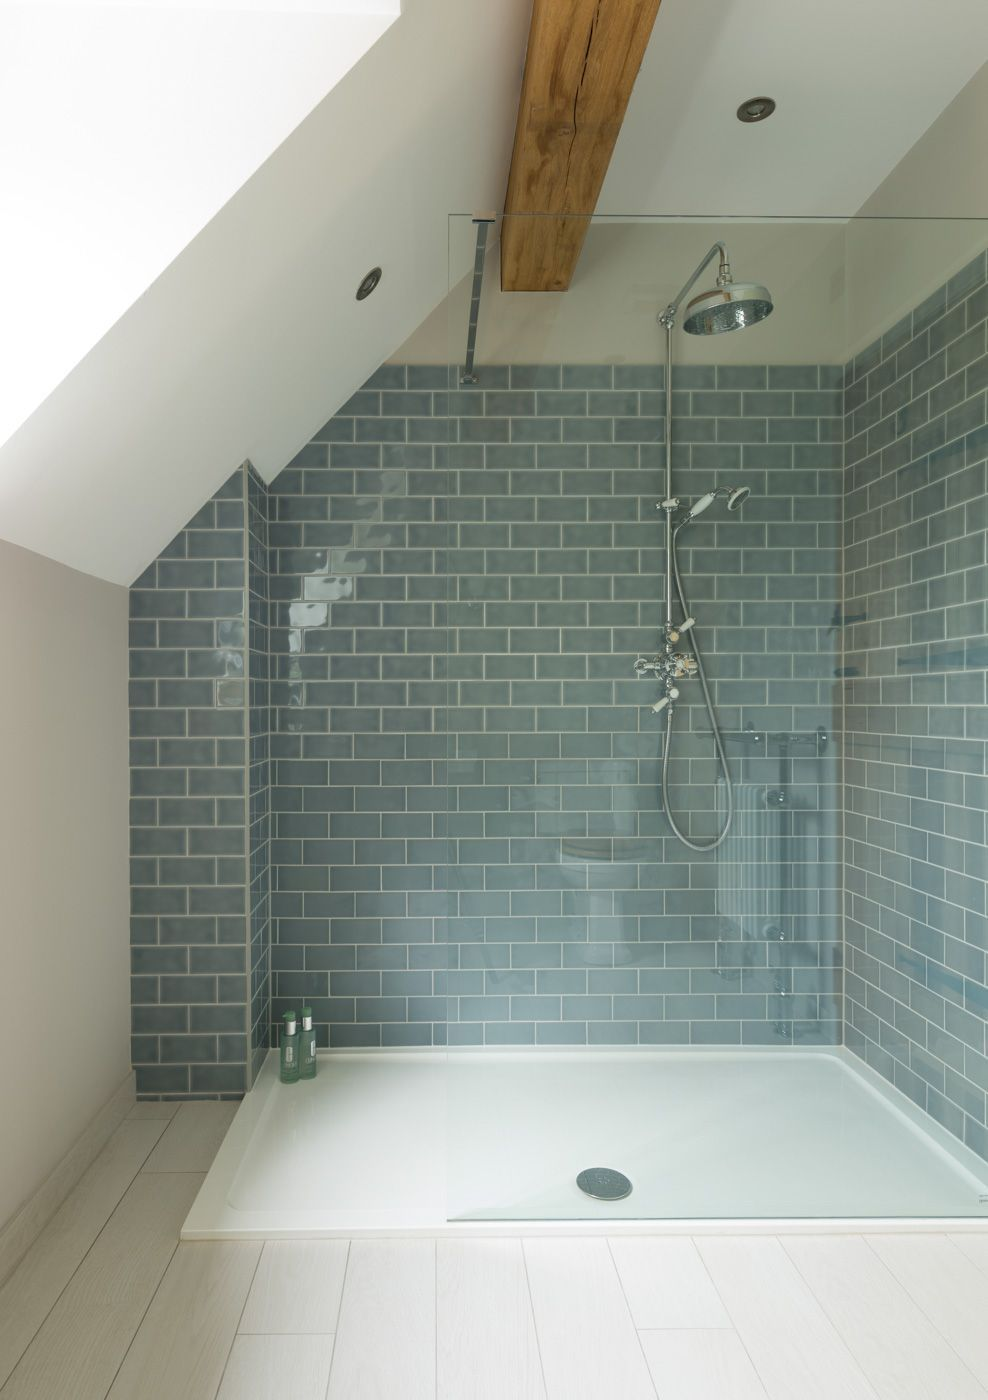 50 Rustic Farmhouse Master Bathroom Remodel Ideas 2018 Small